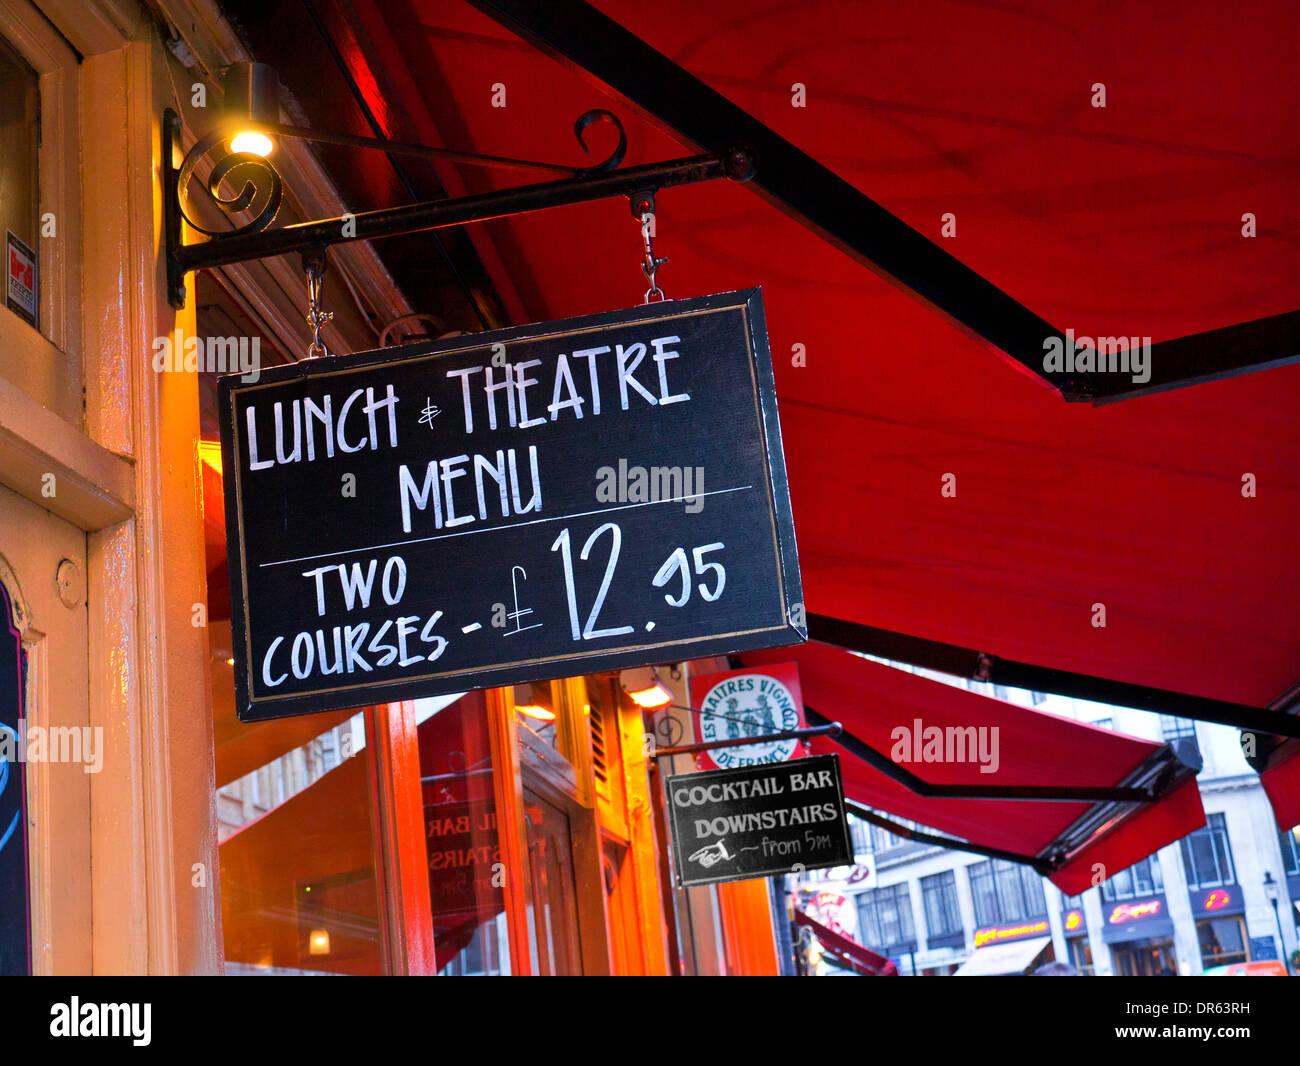 Restaurant blackboard theatre menu in Covent Garden London - Stock Image